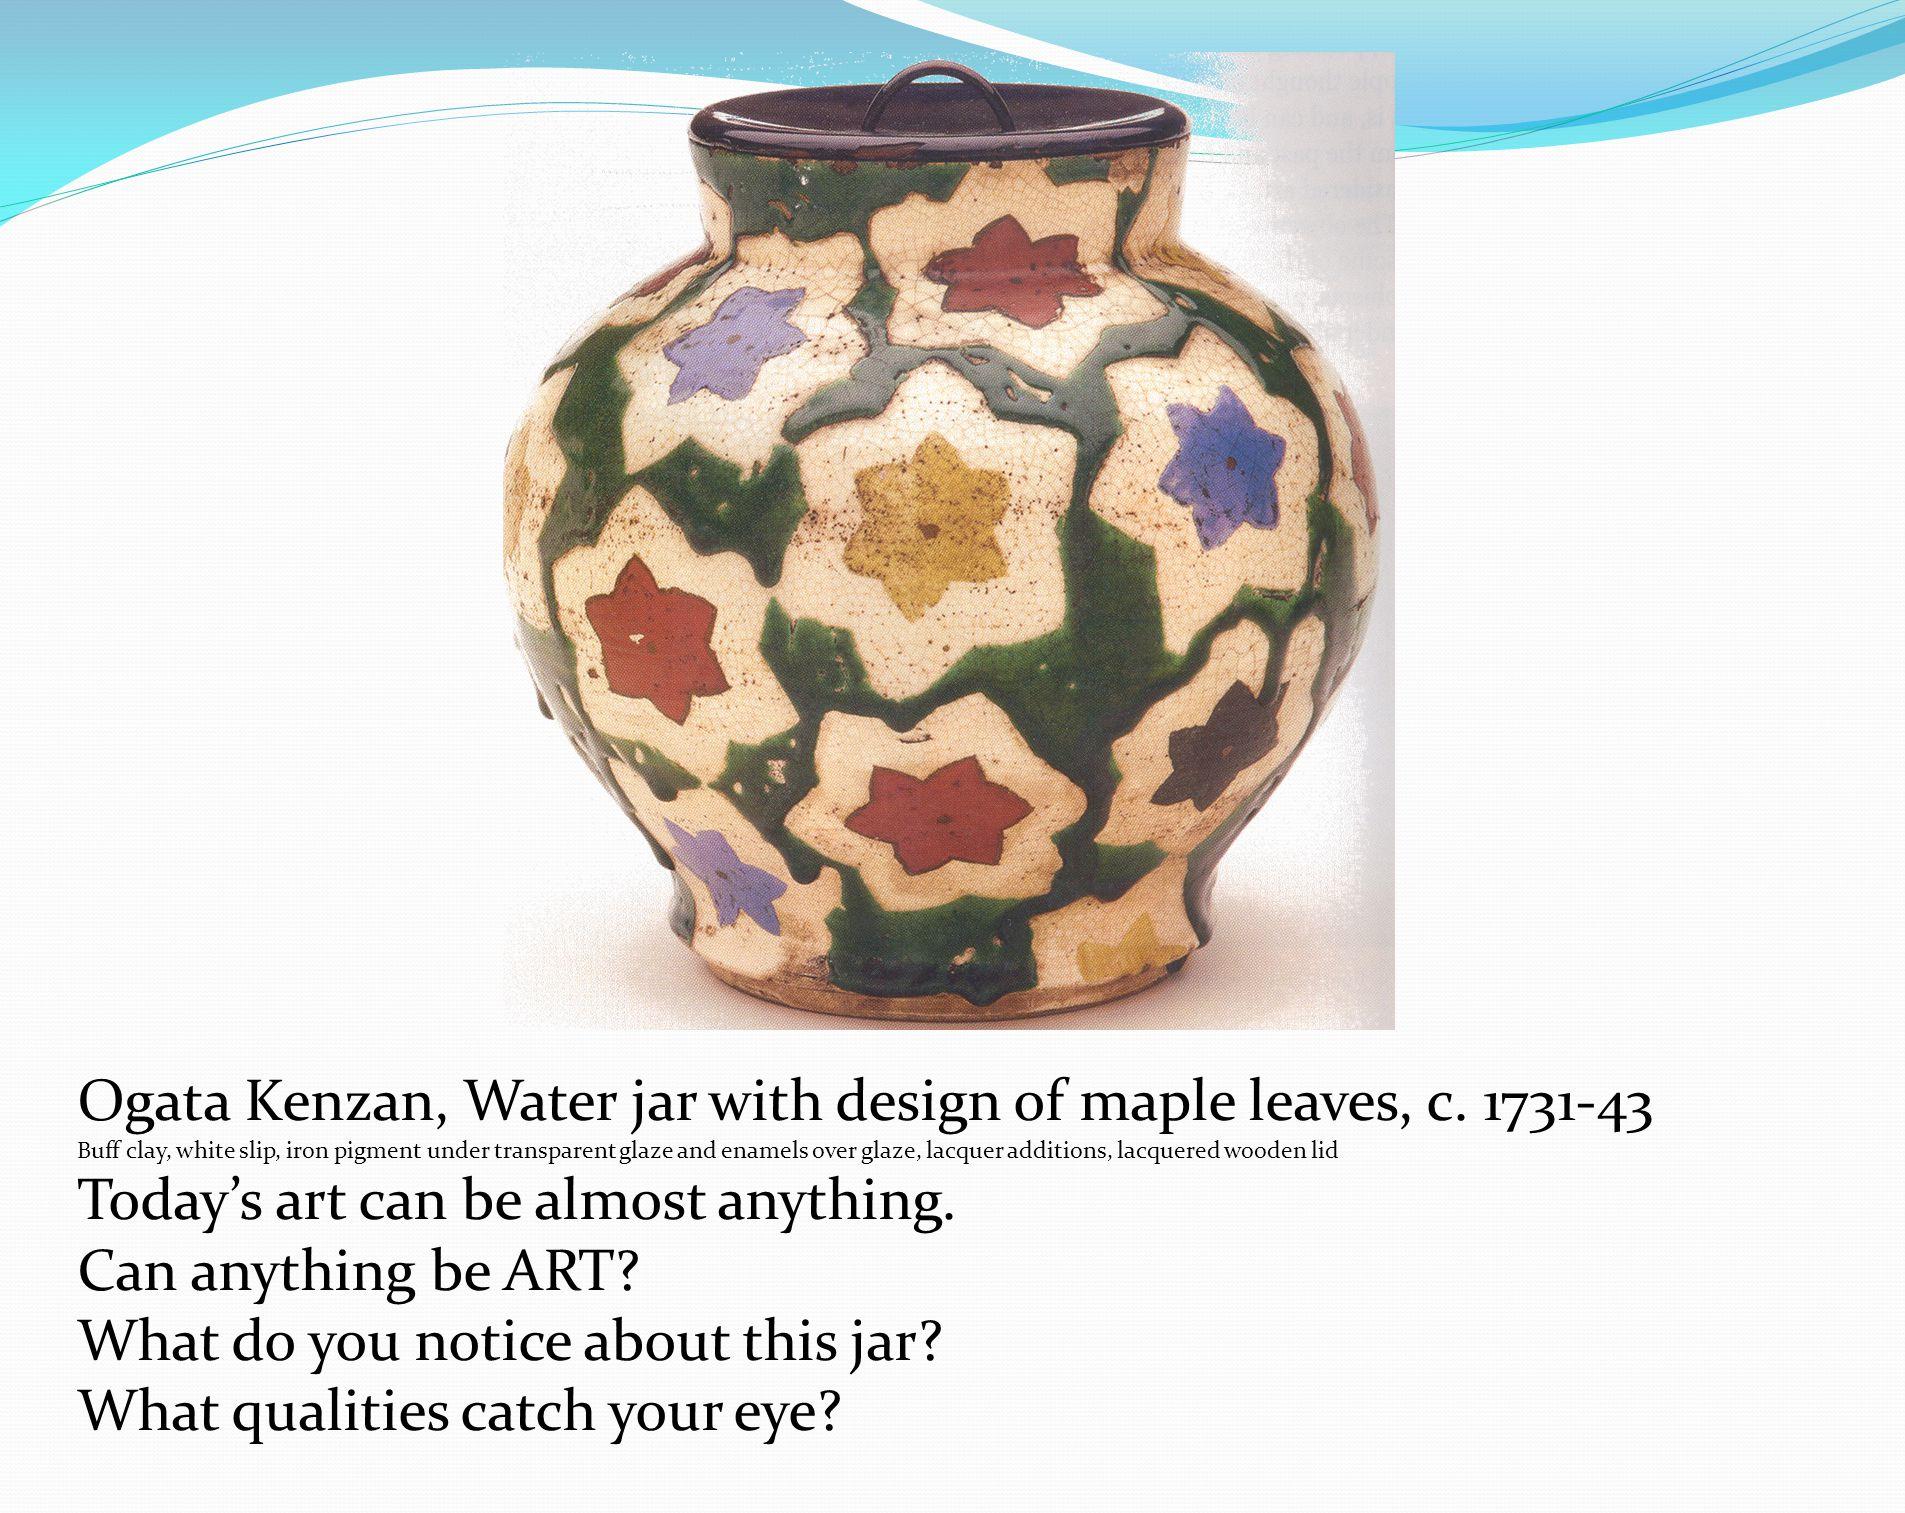 Ogata Kenzan, Water jar with design of maple leaves, c.